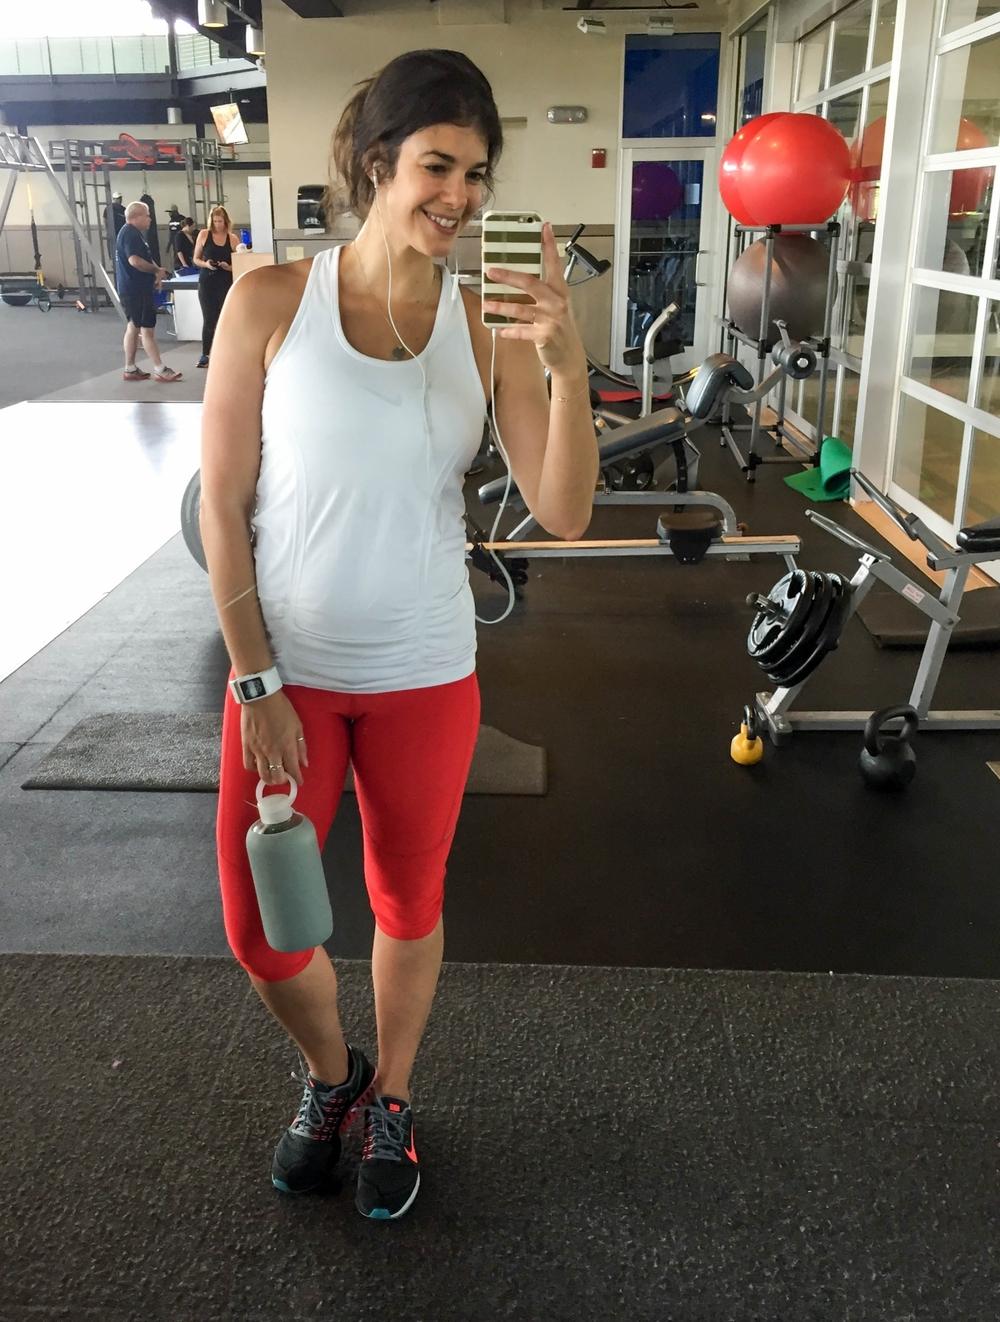 LaurenSchwaiger-Health-Fitness-Blog-Workouts-This-Week-Nike-Red-Capris.jpg